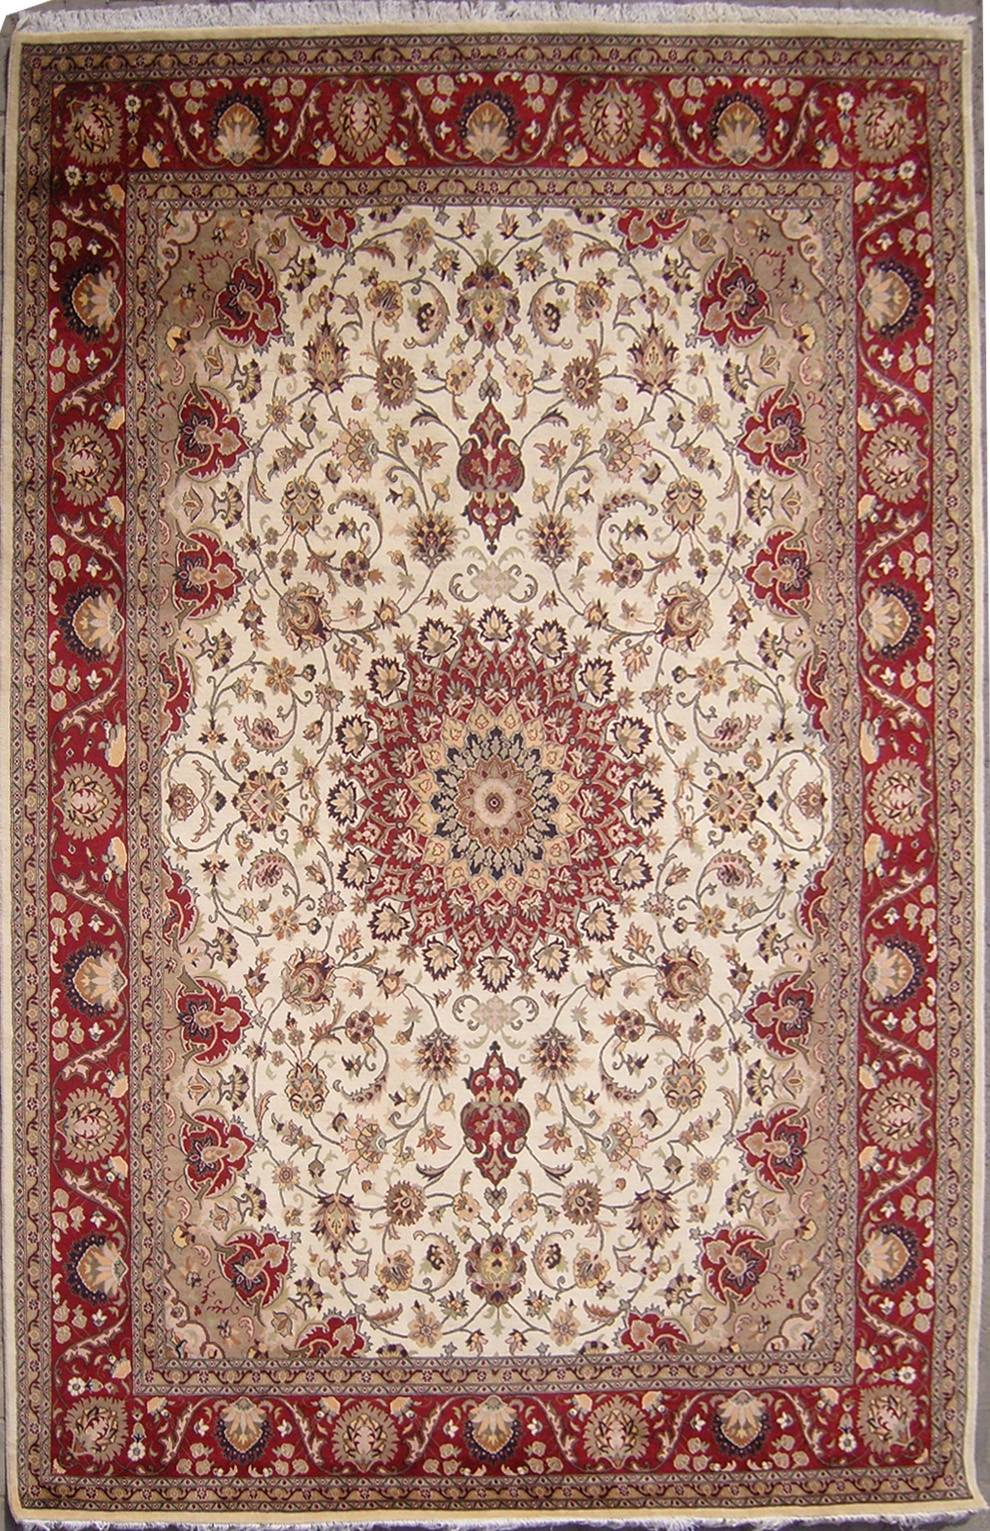 8 39 11x12 39 4 Rug Double Knott Pak Persian Design Handmade